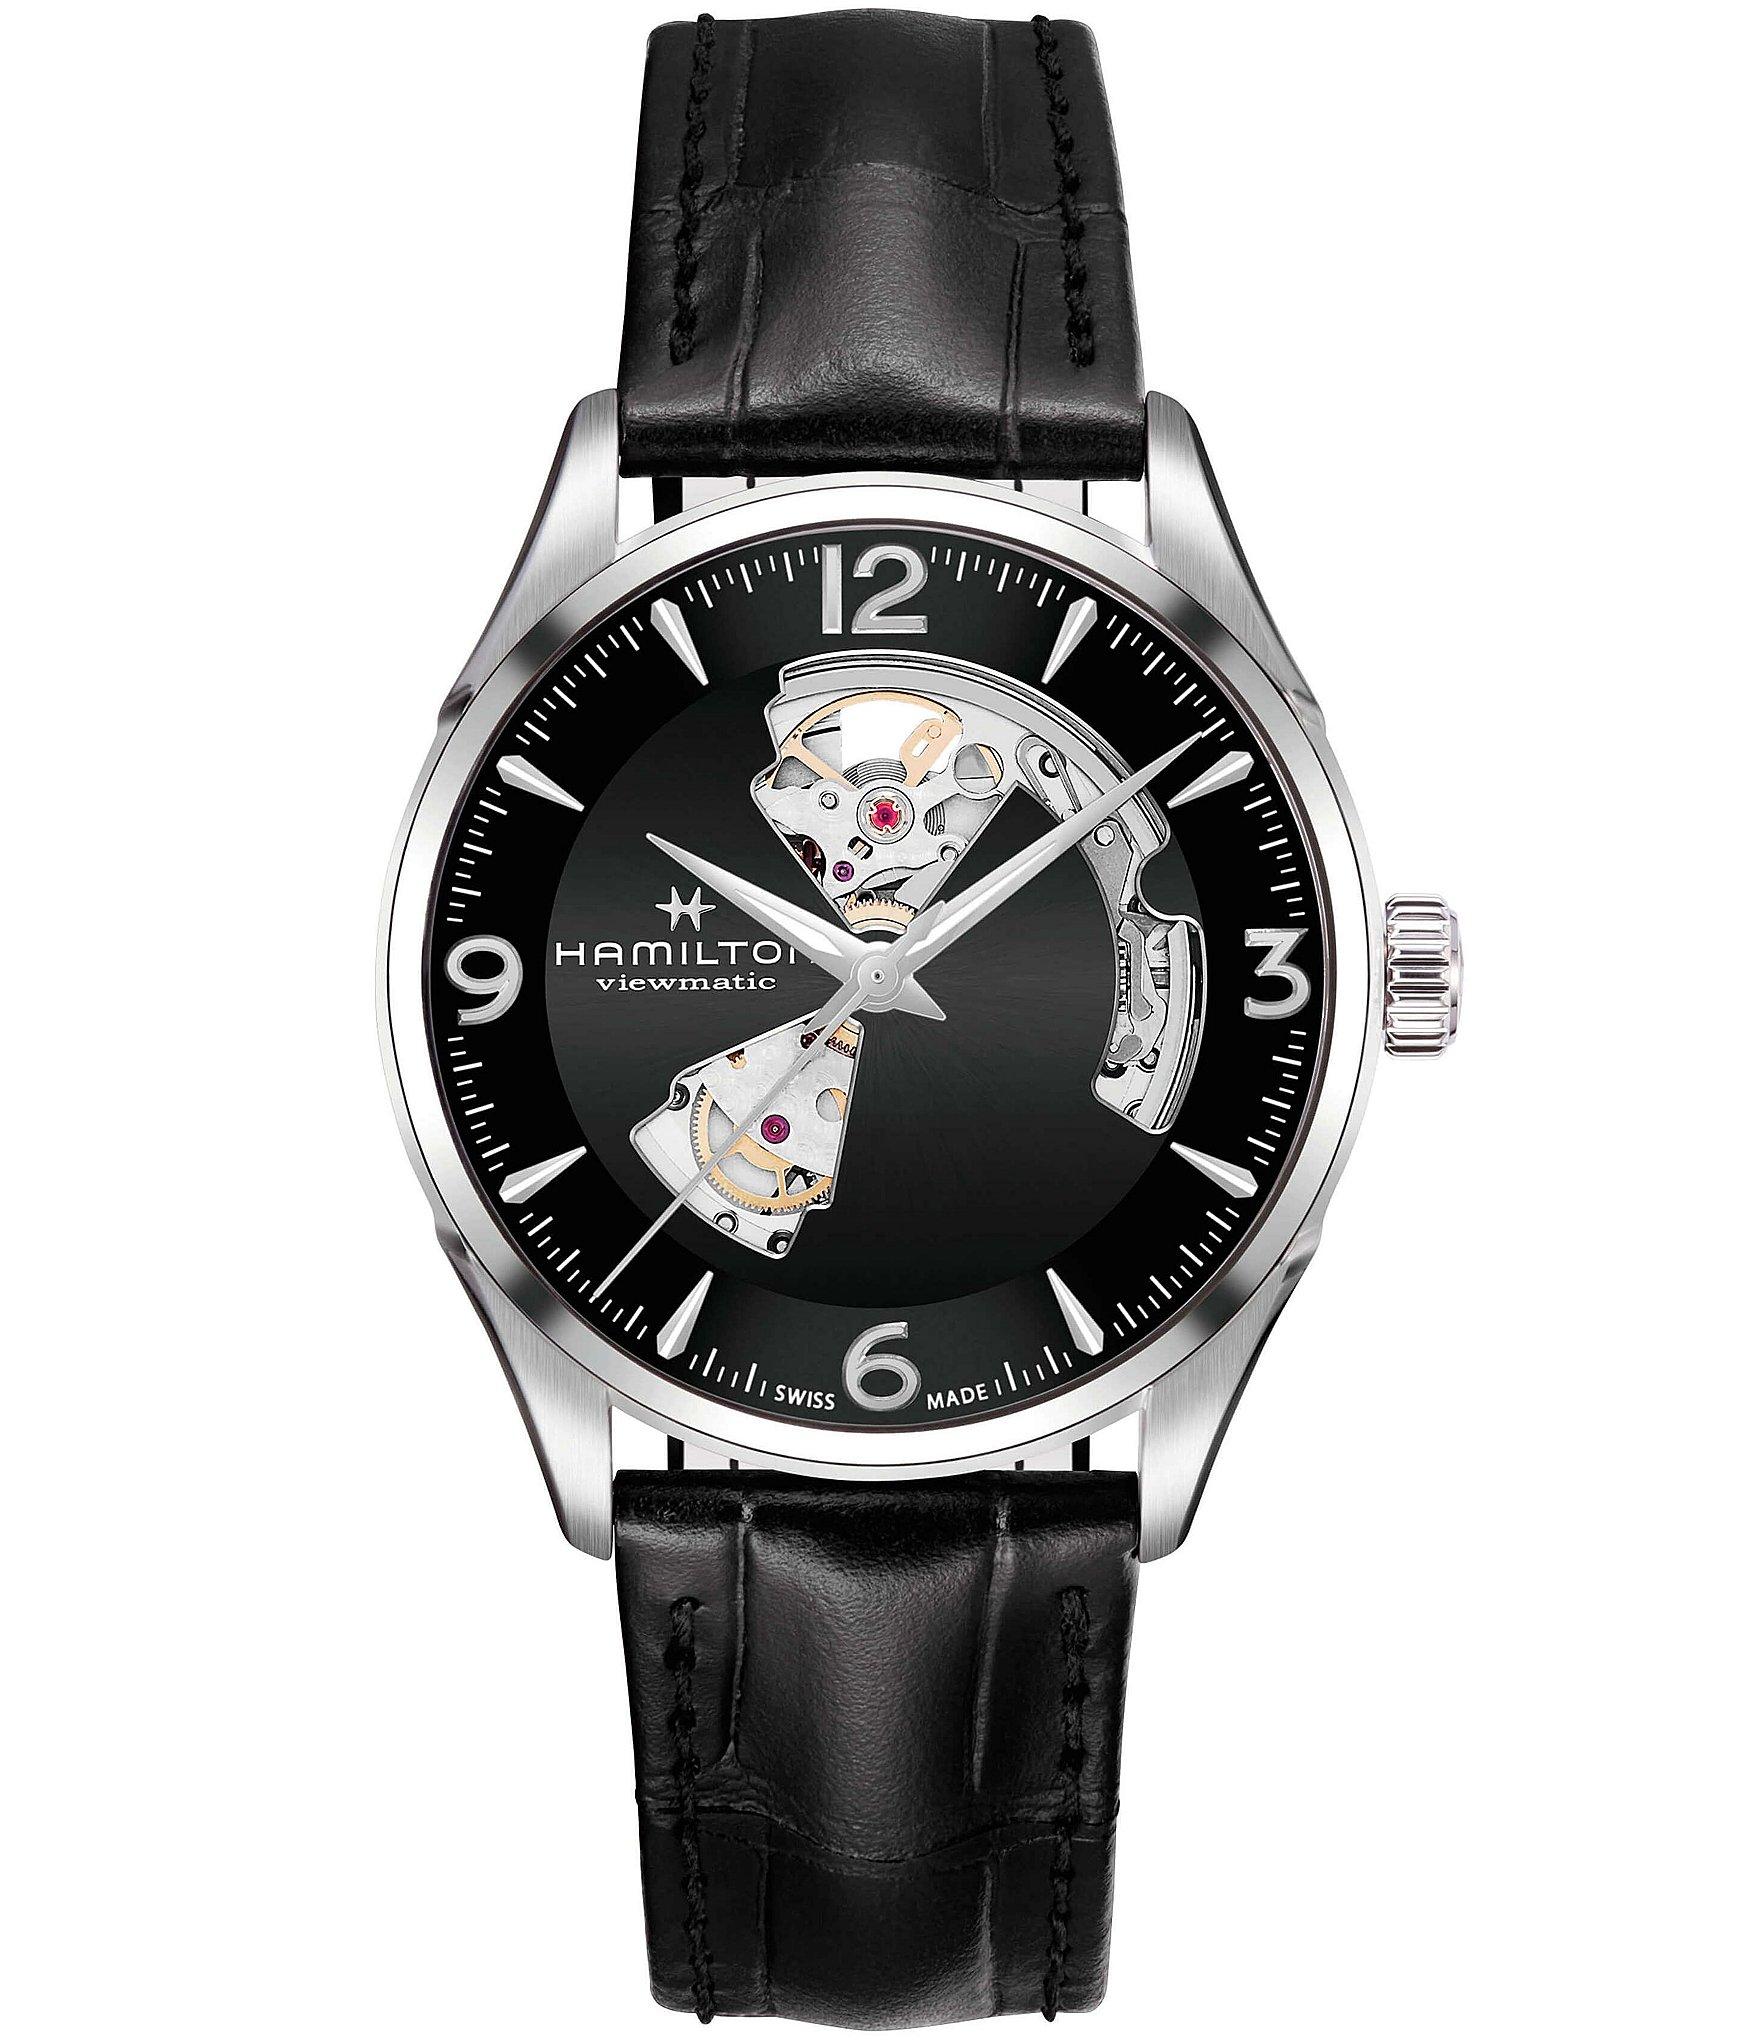 845f6681eb53 Hamilton Watches for Men   Women